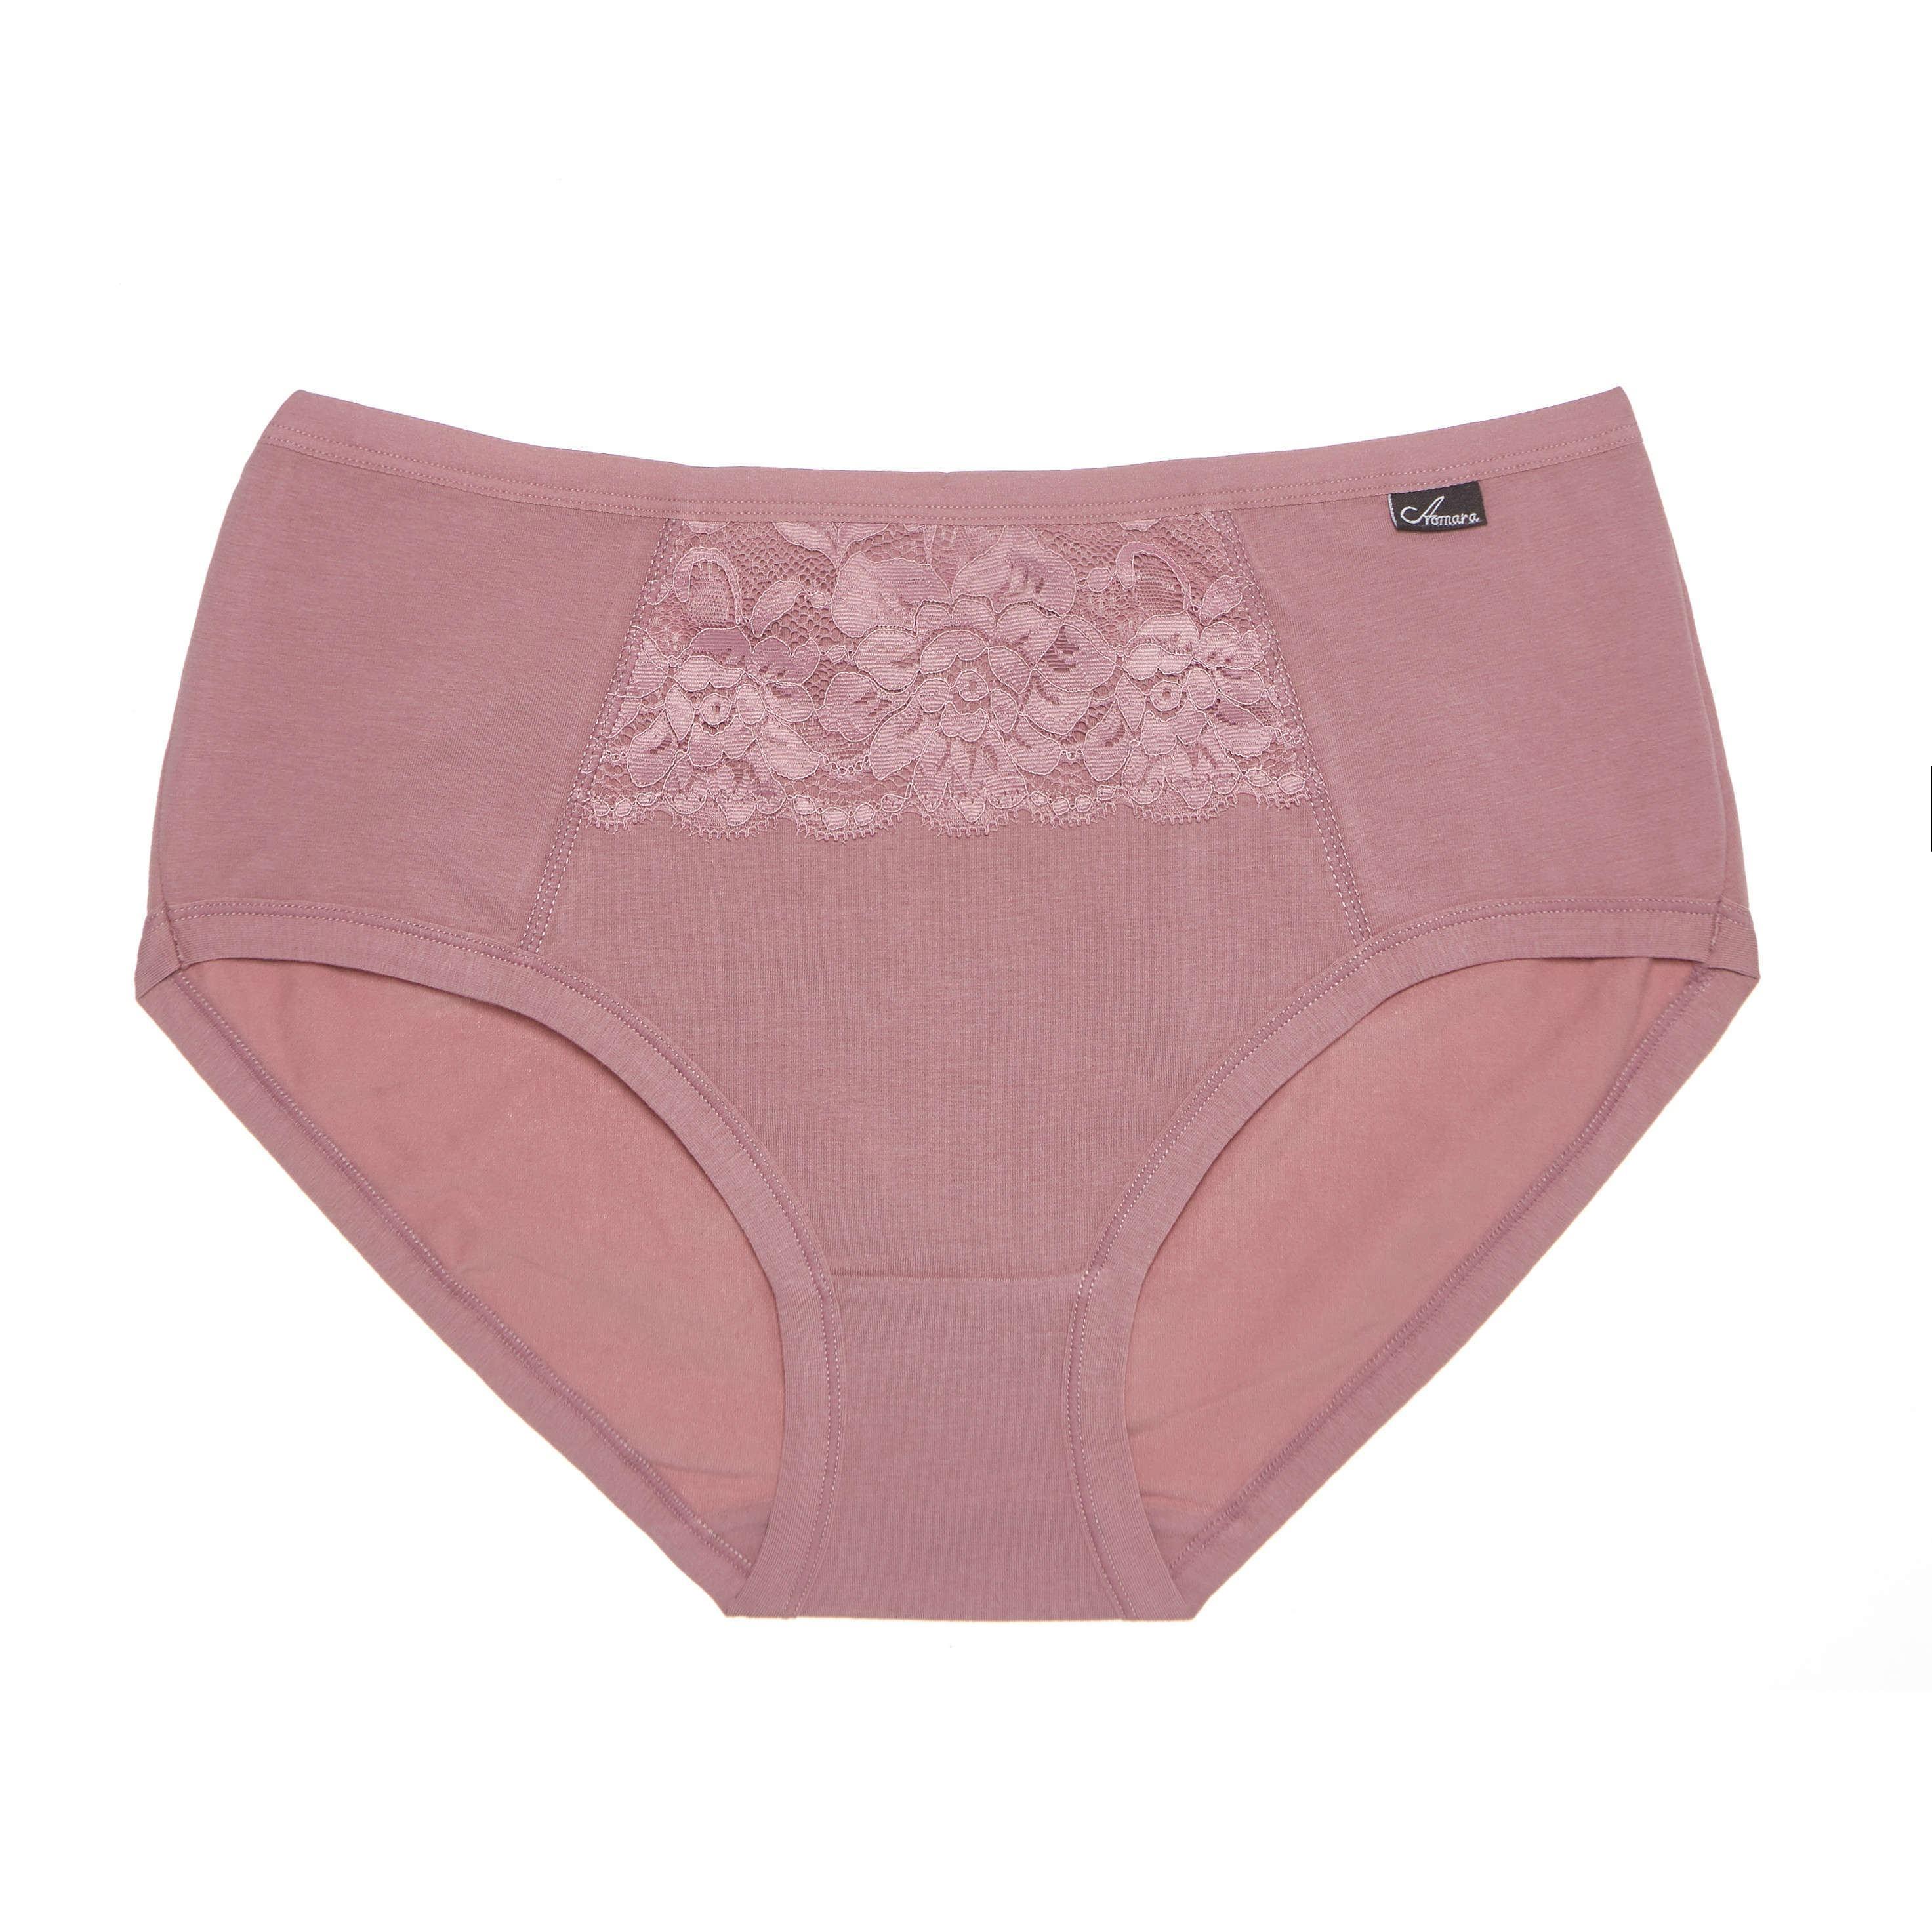 Women Physiological Briefs Menstrual Period Underwear Seamless Leakproof Pan ZSH